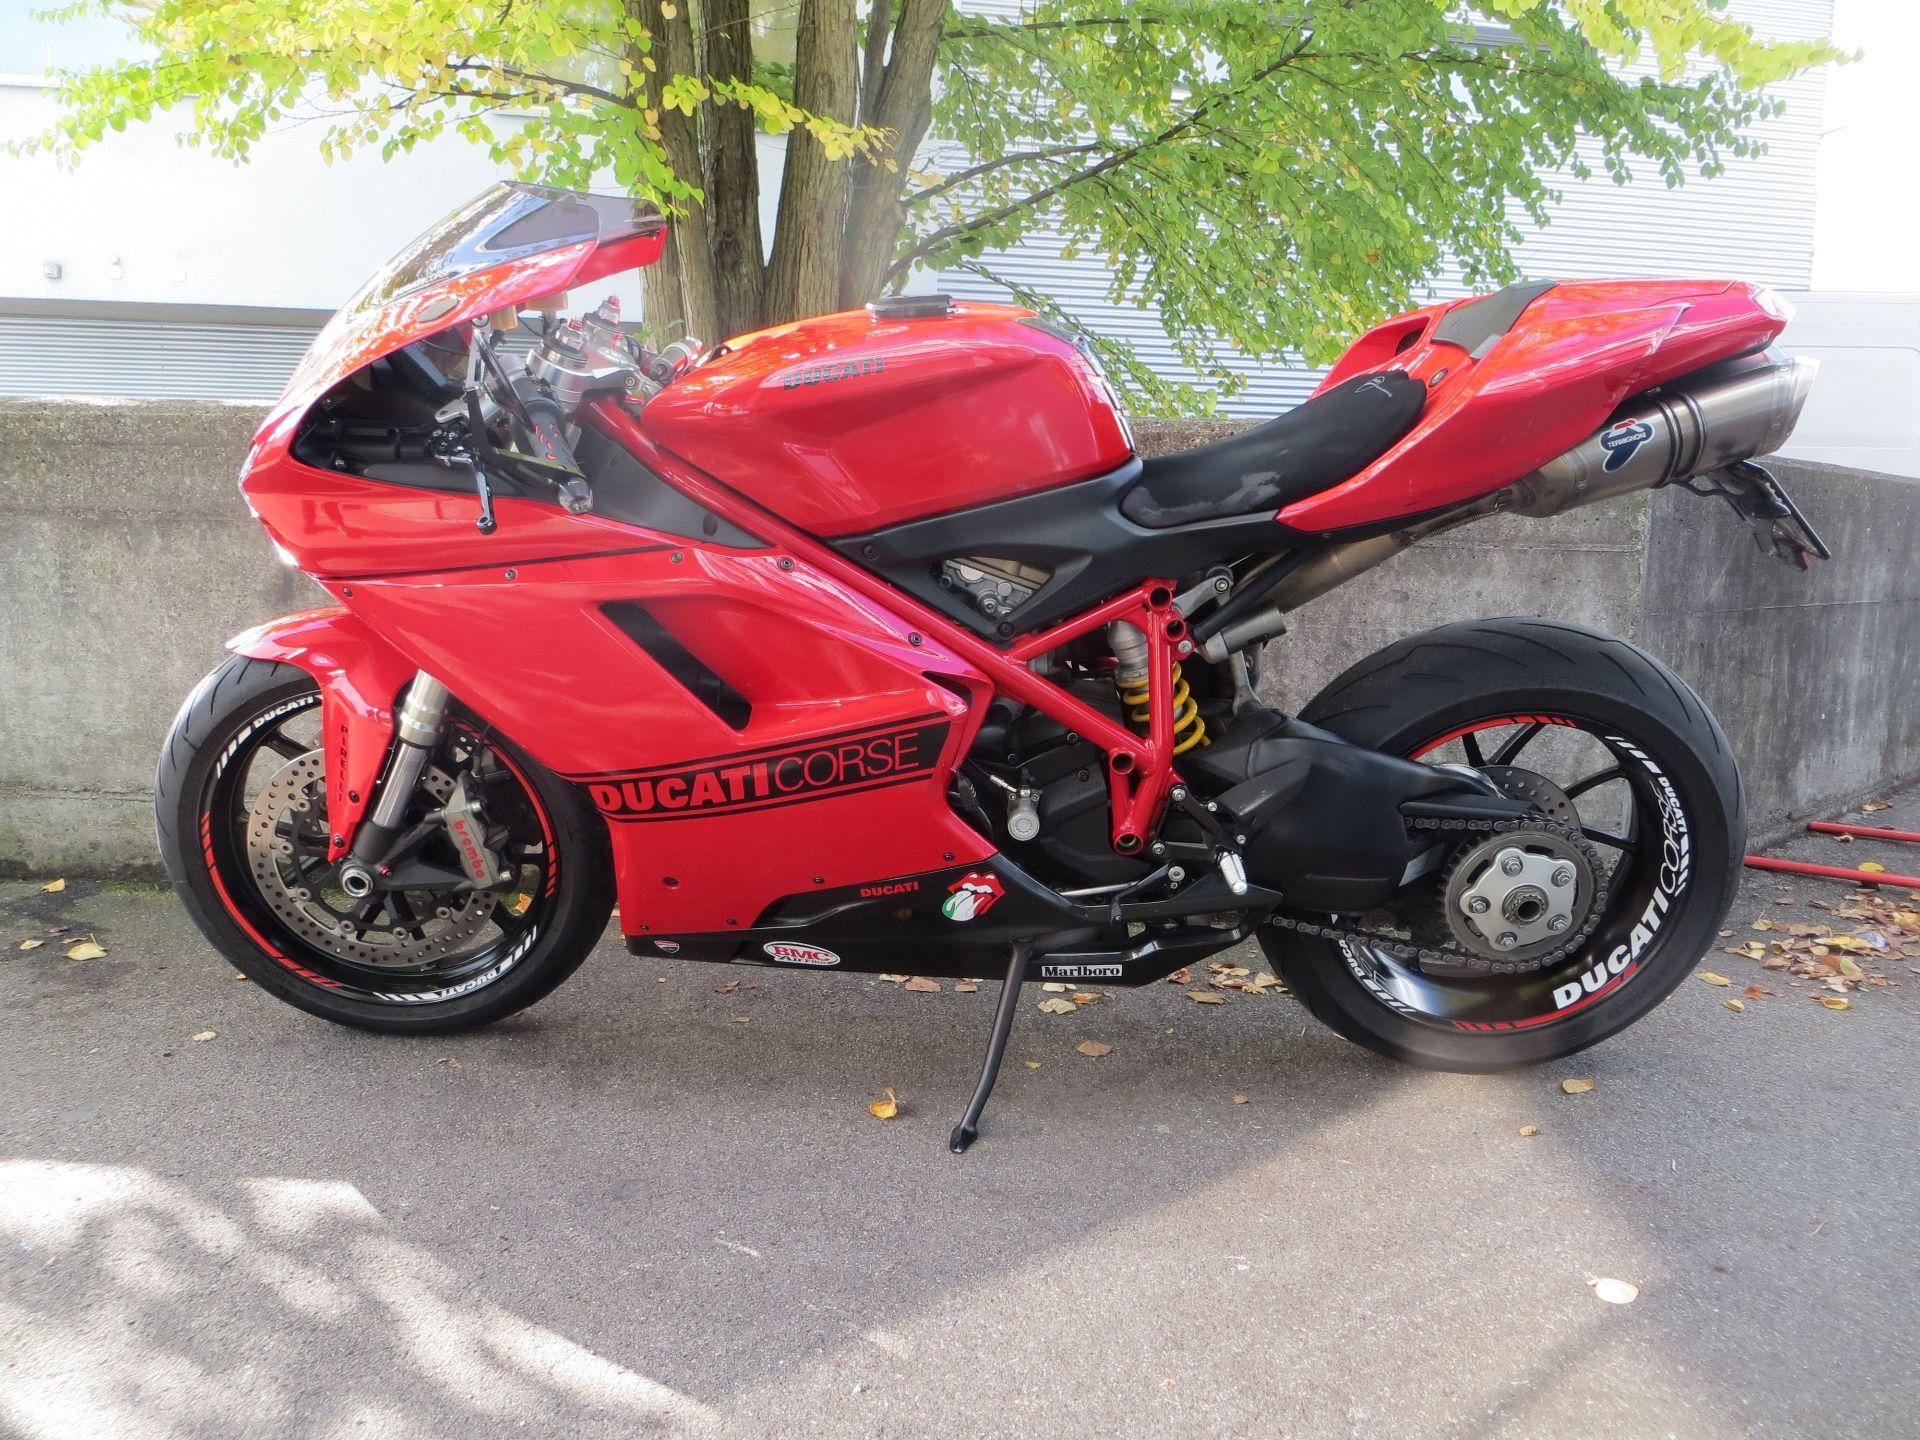 motorrad occasion kaufen ducati 848 superbike evo roli s motostyling gmbh schlieren. Black Bedroom Furniture Sets. Home Design Ideas